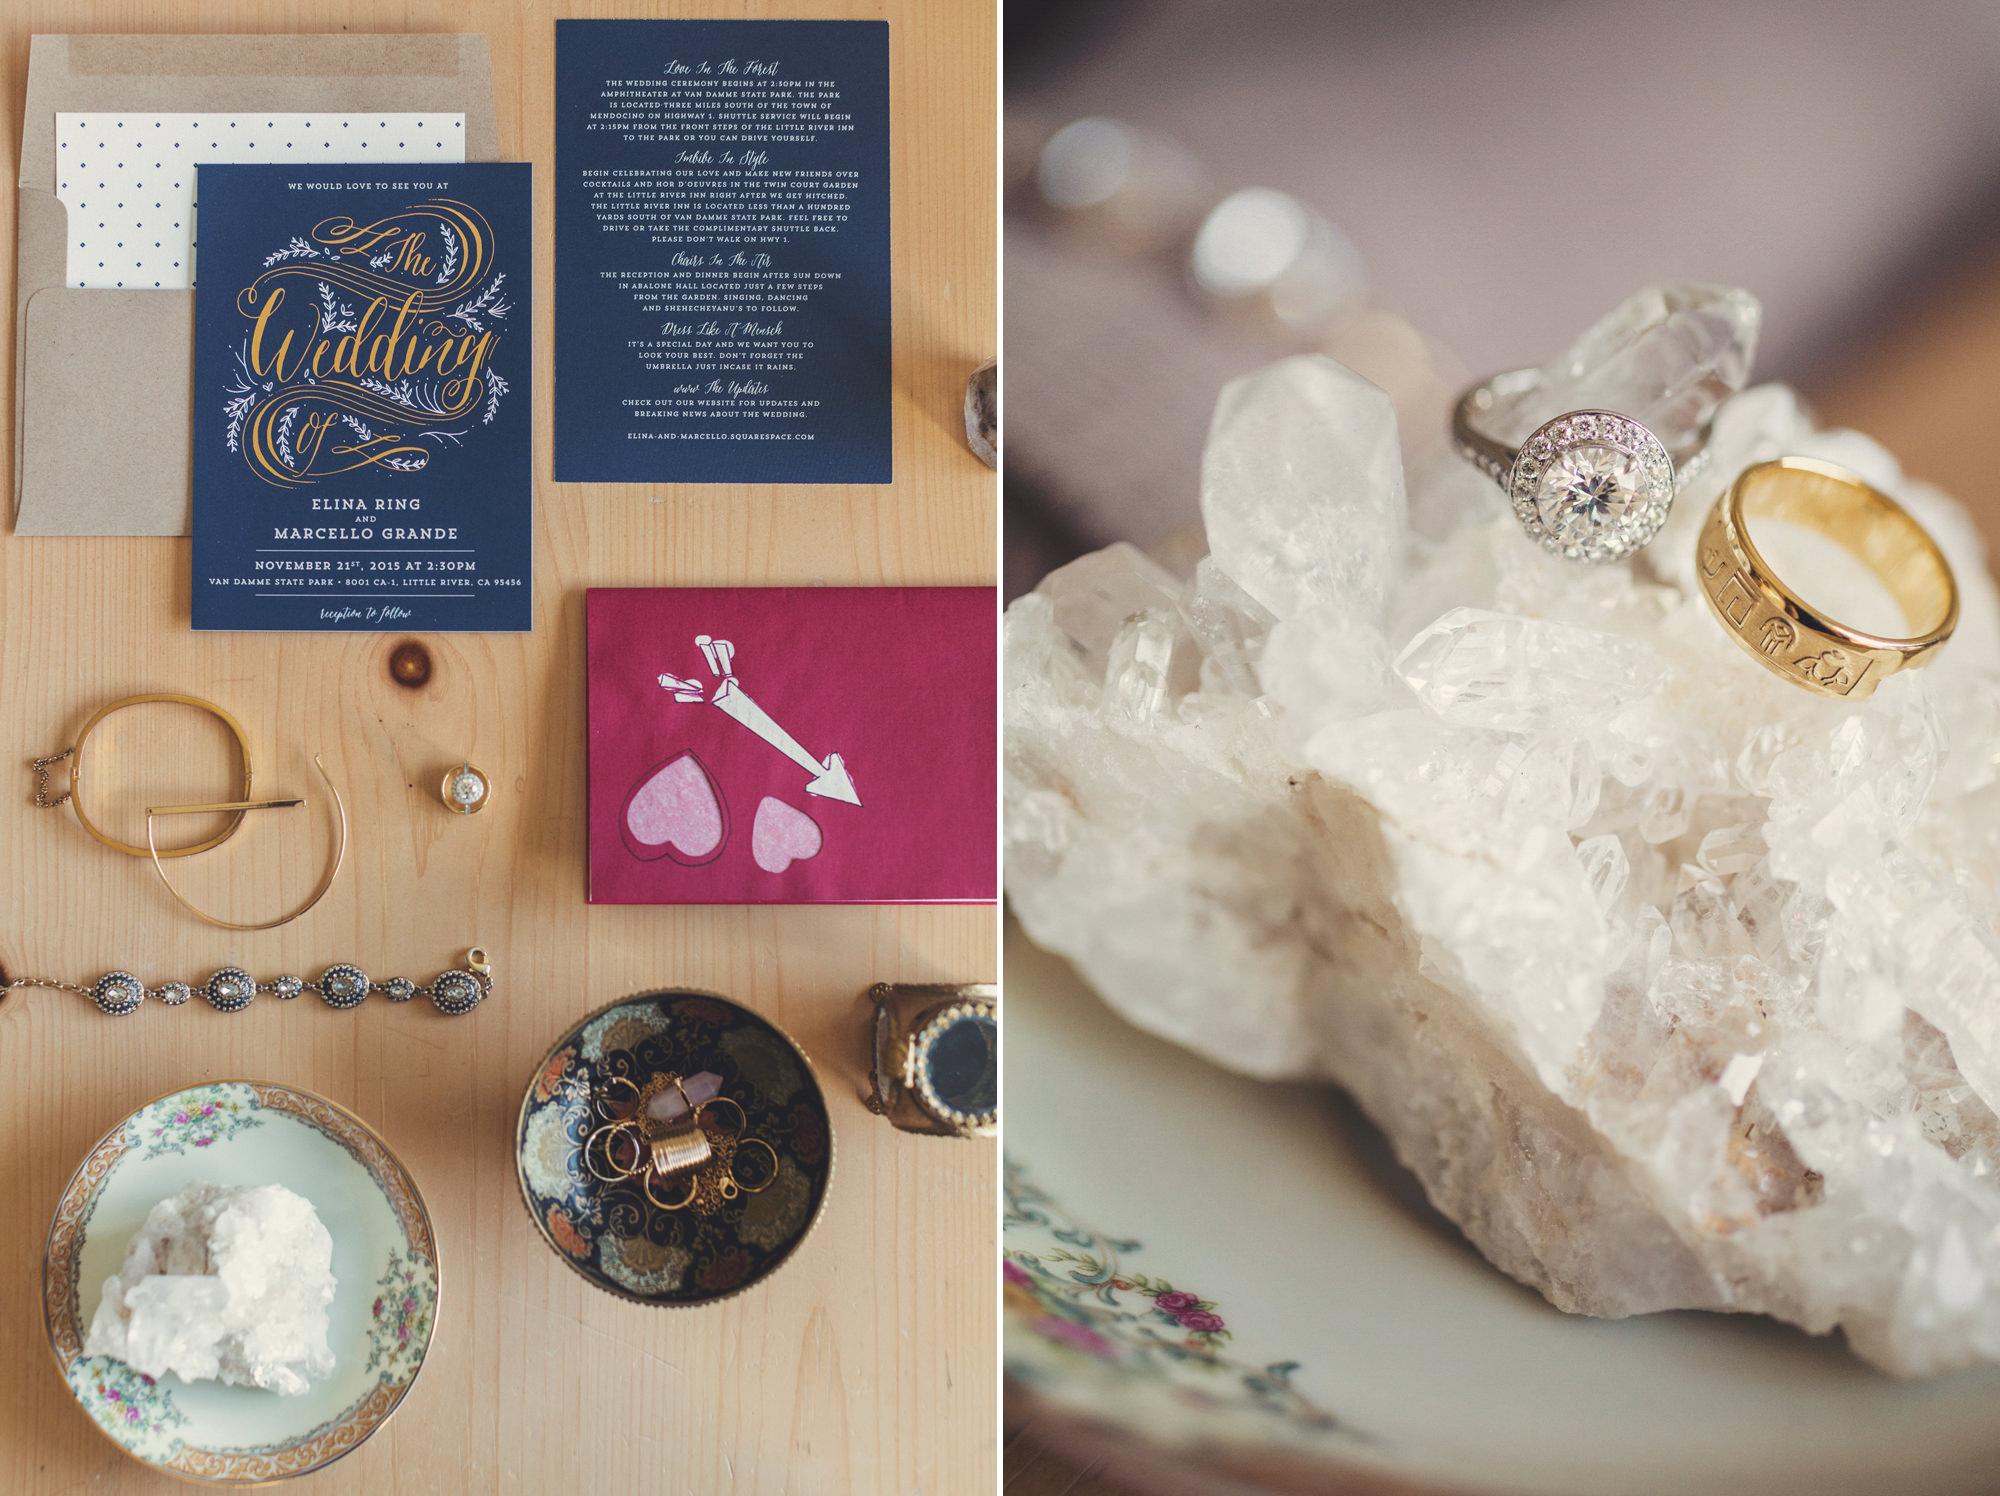 Little River Inn Wedding@Anne-Claire Brun 17